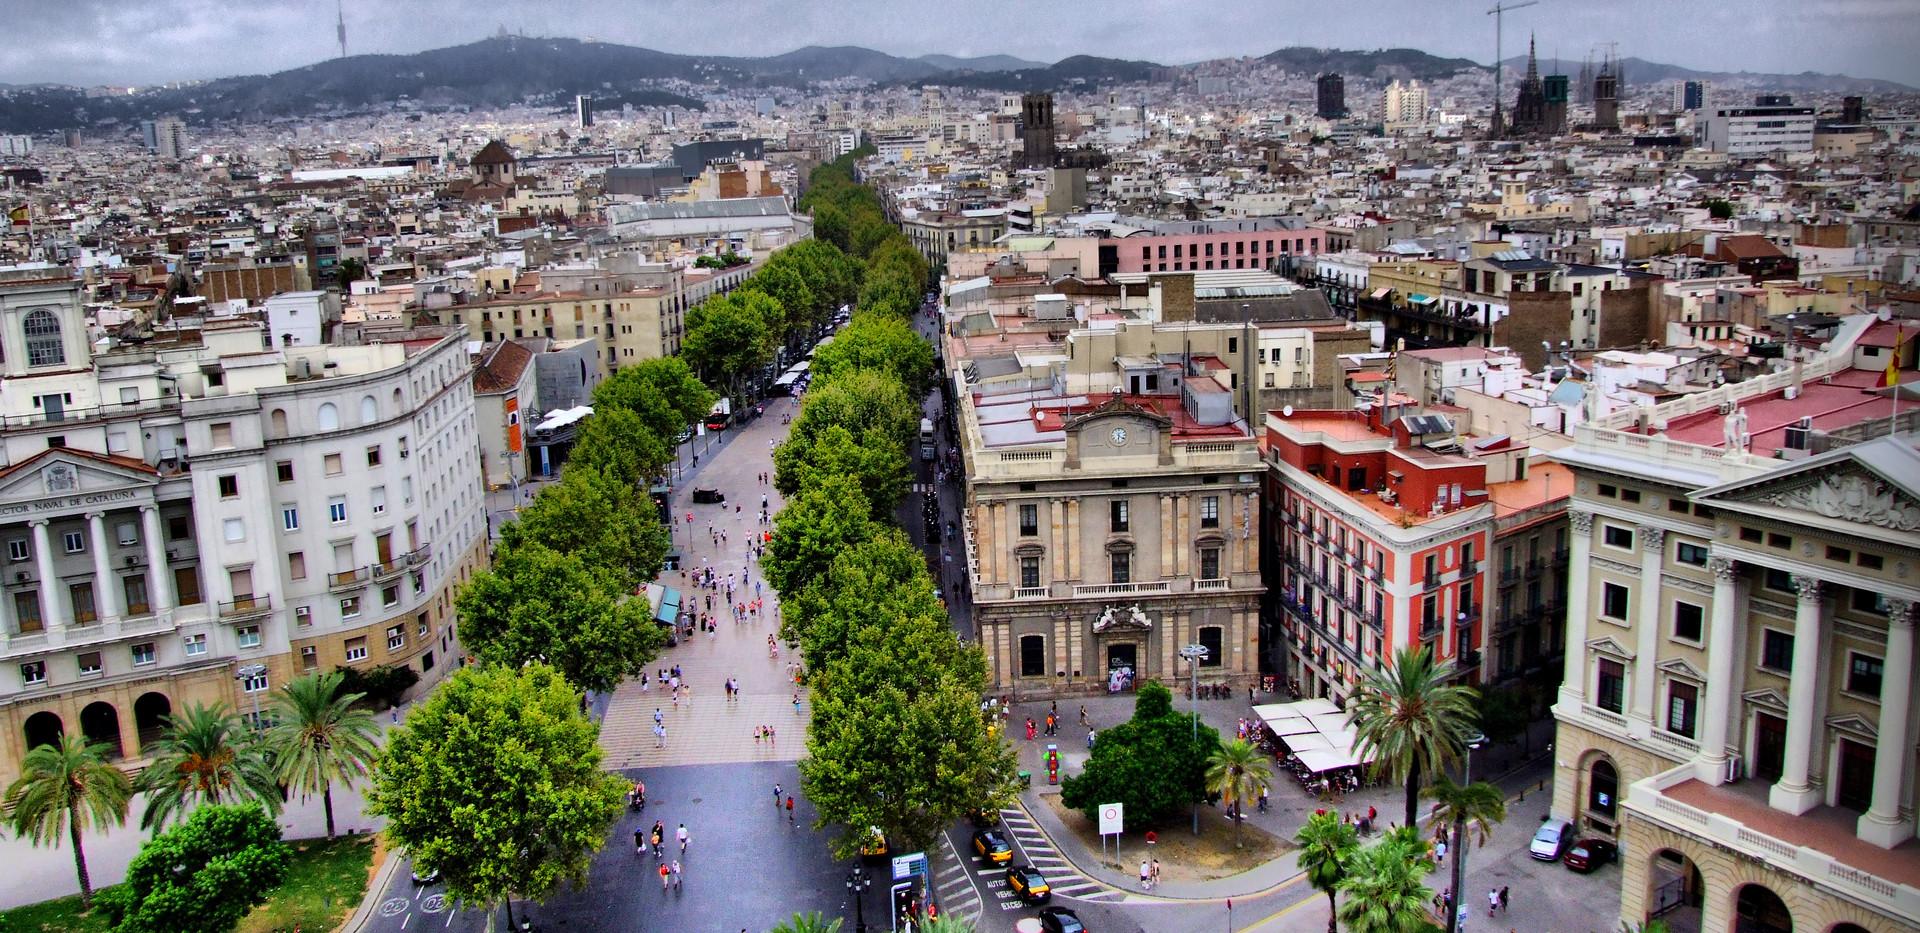 Barcelona_North-East_(2806934358).jpg